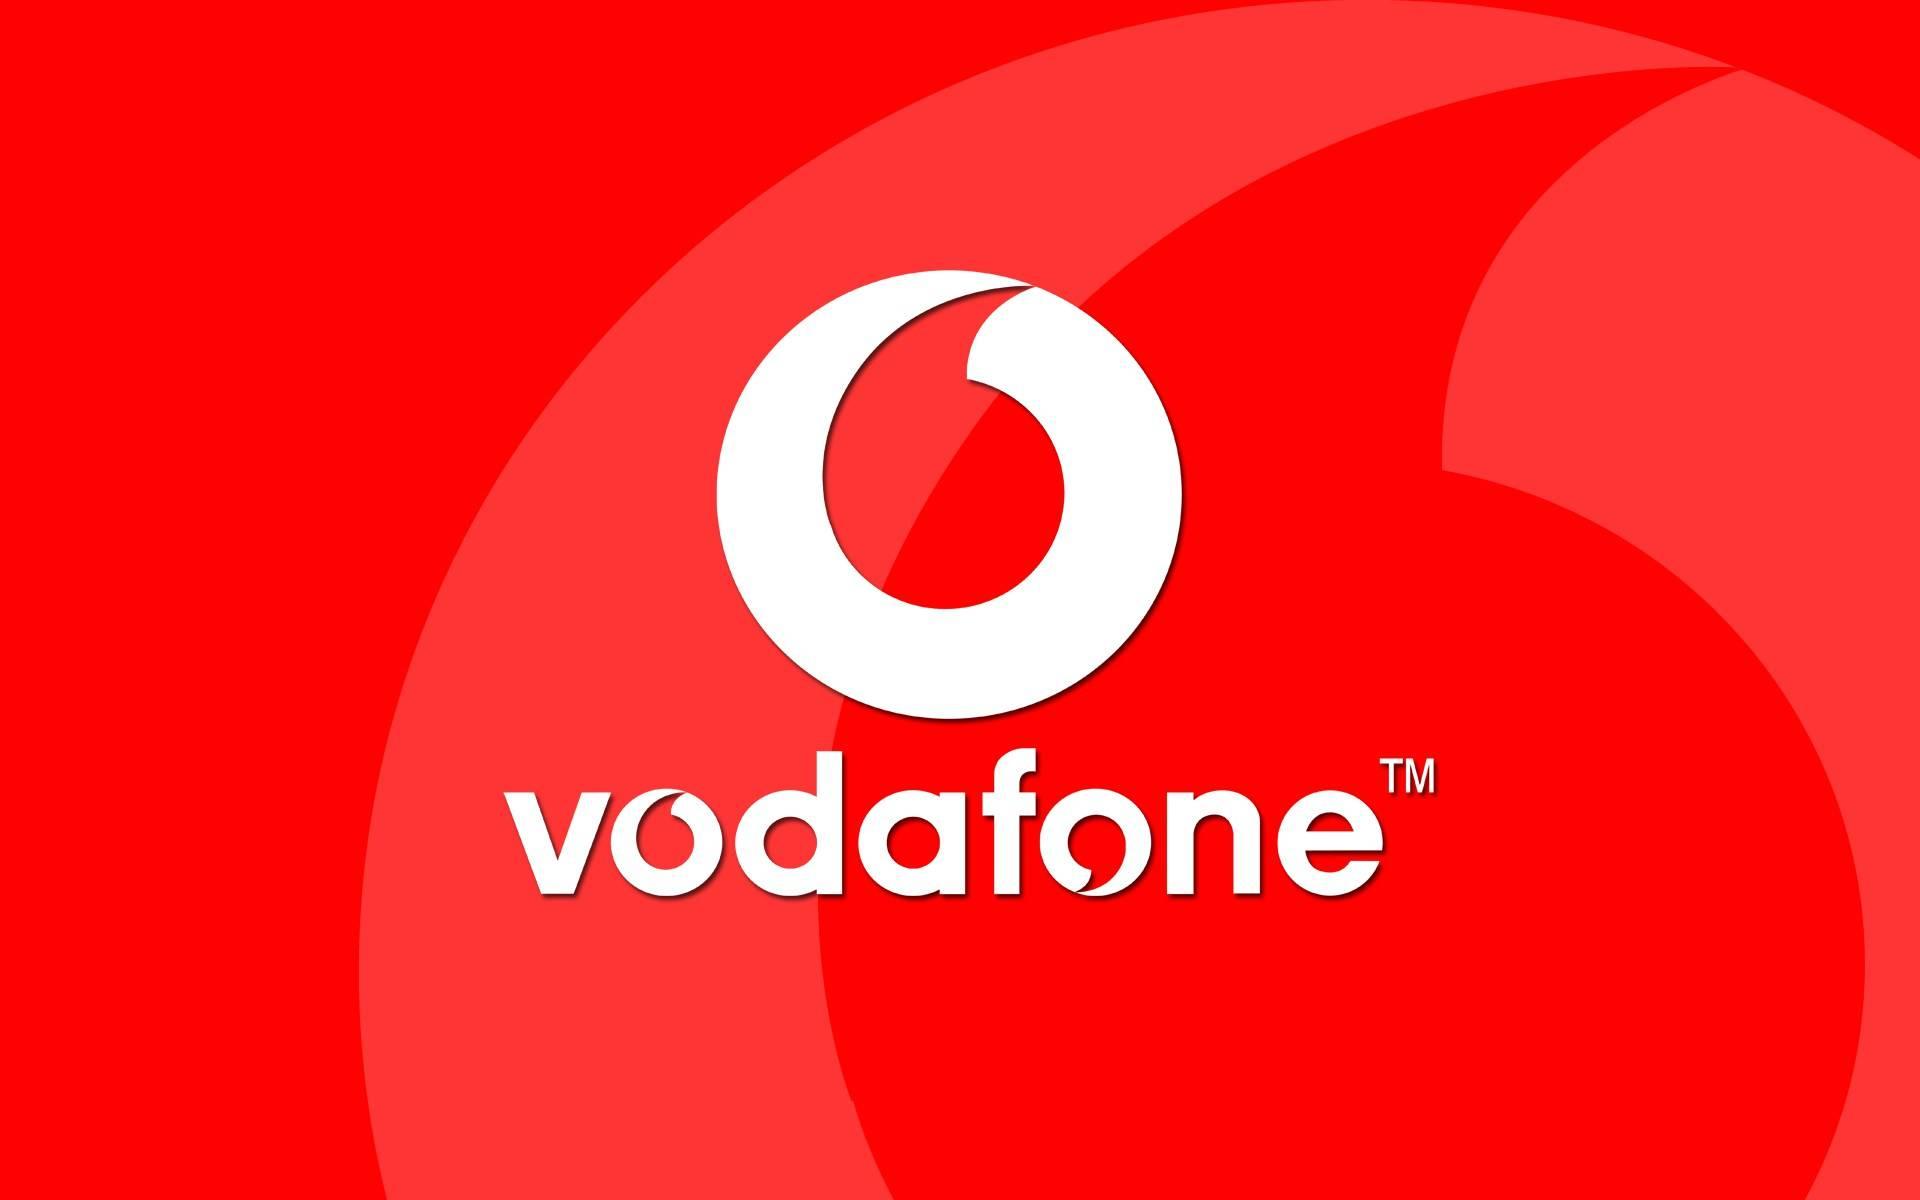 Vodafone magazine